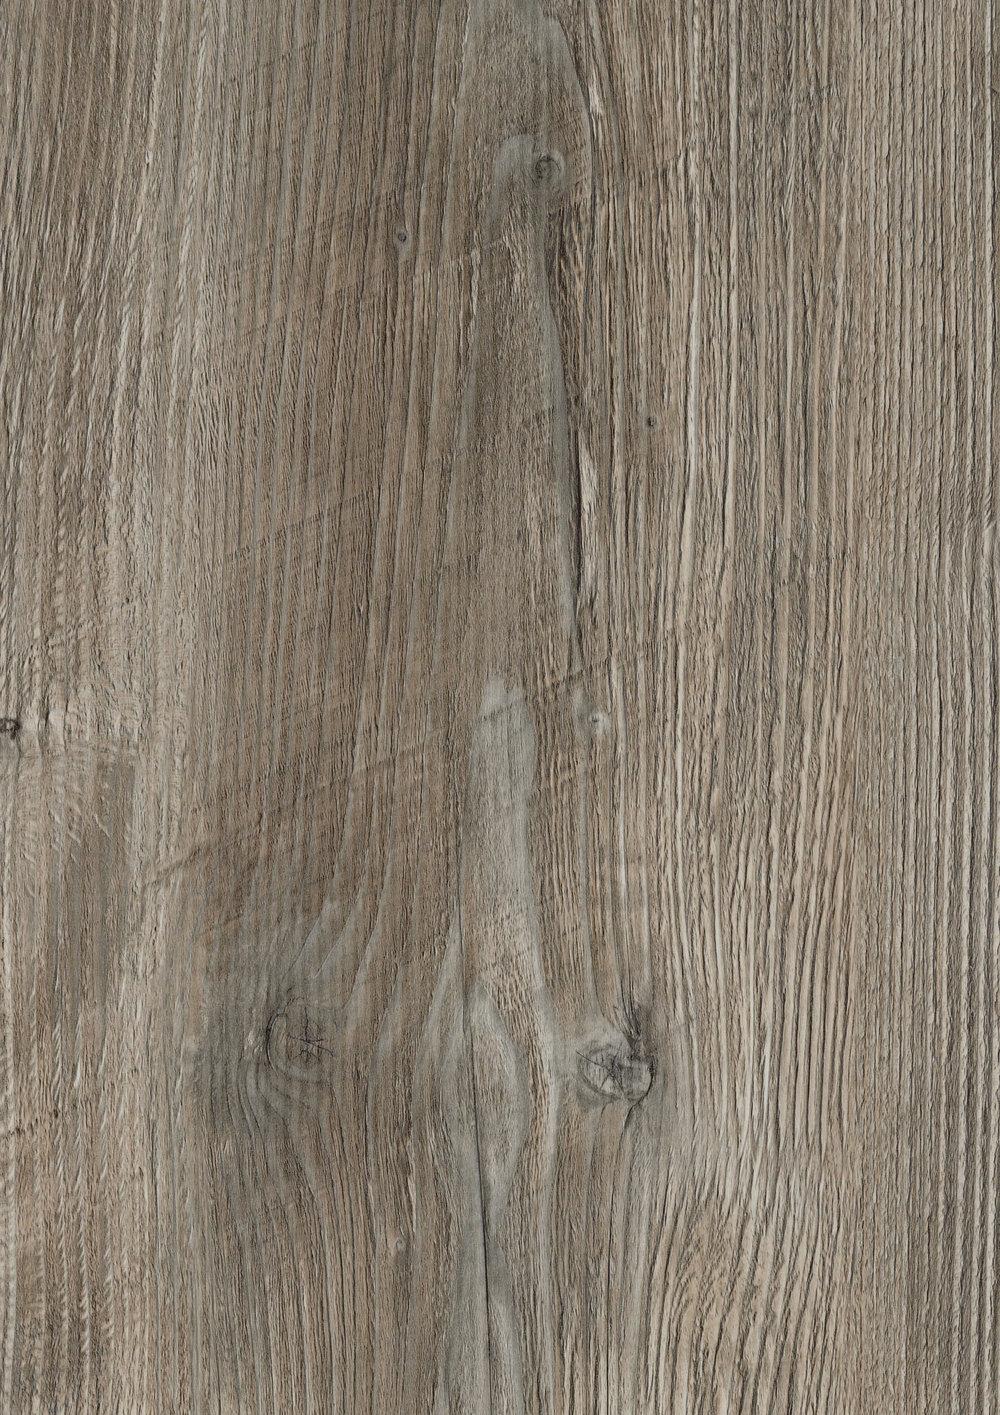 Ponderosa Pine R55004